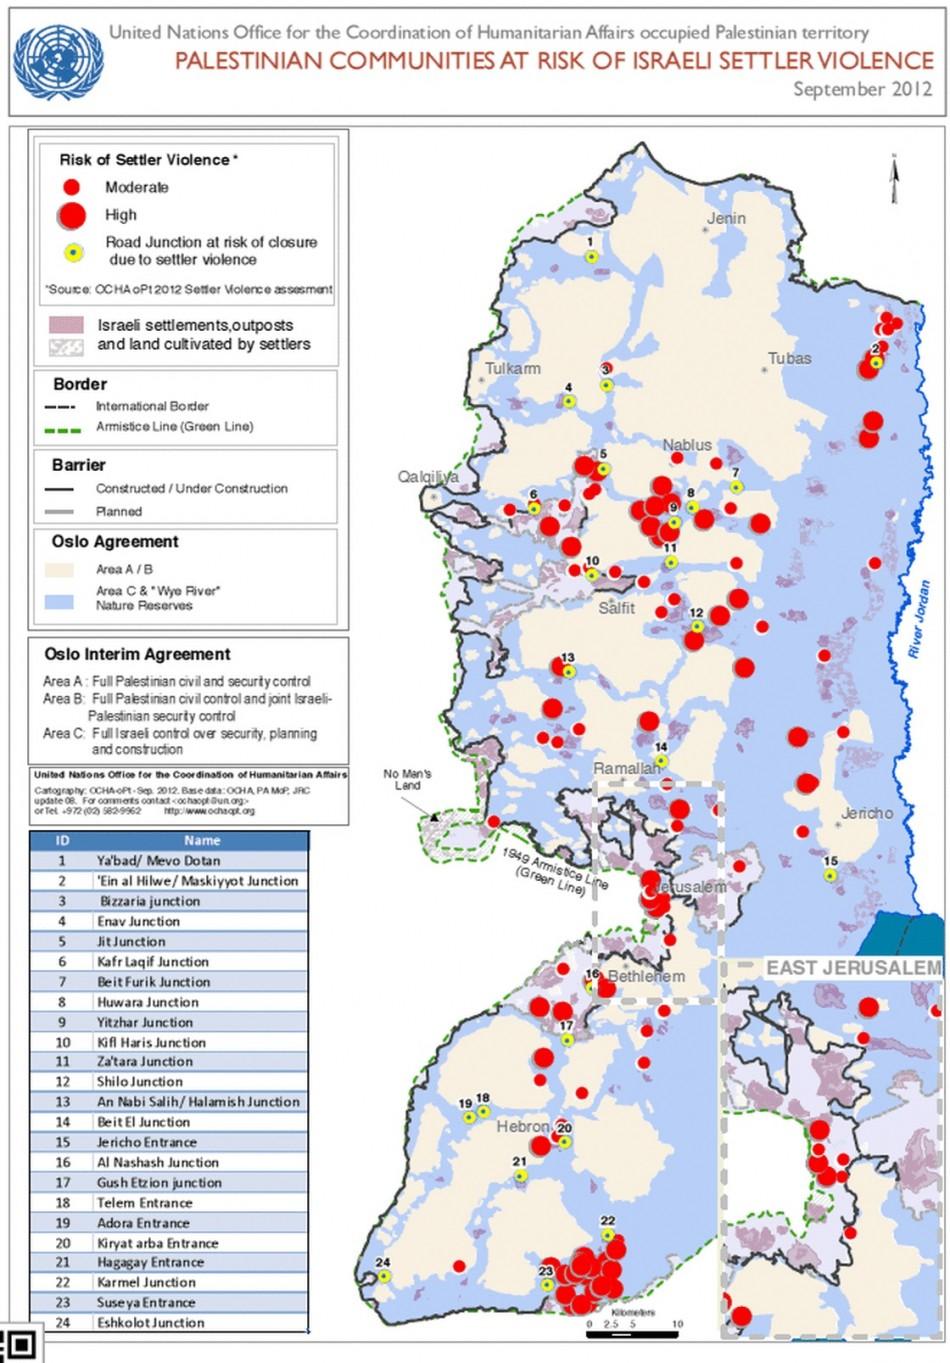 Palestinian communities at risk of Israeli settler violence (UN)